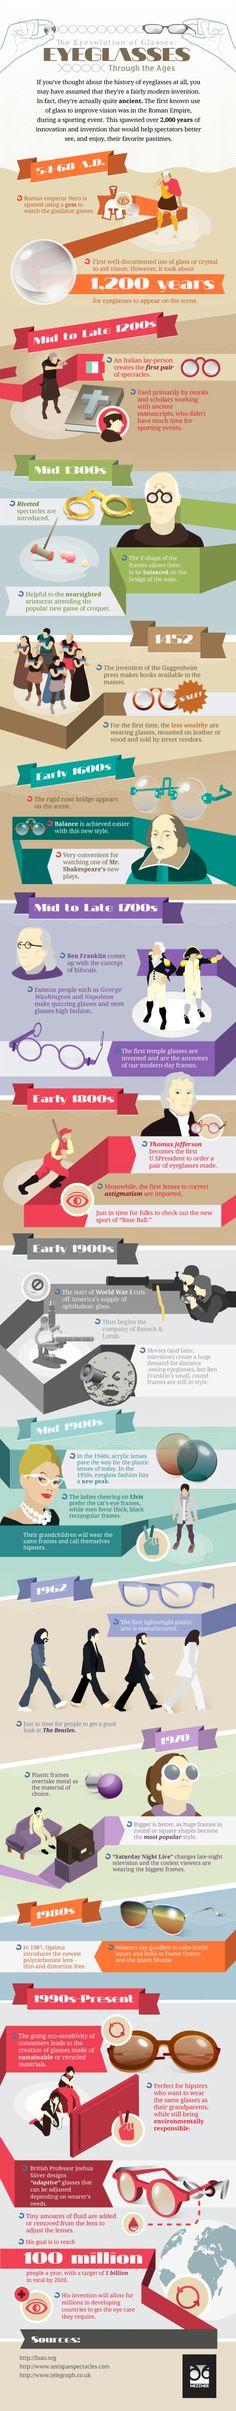 The Evolution of Eyeglasses Infographic